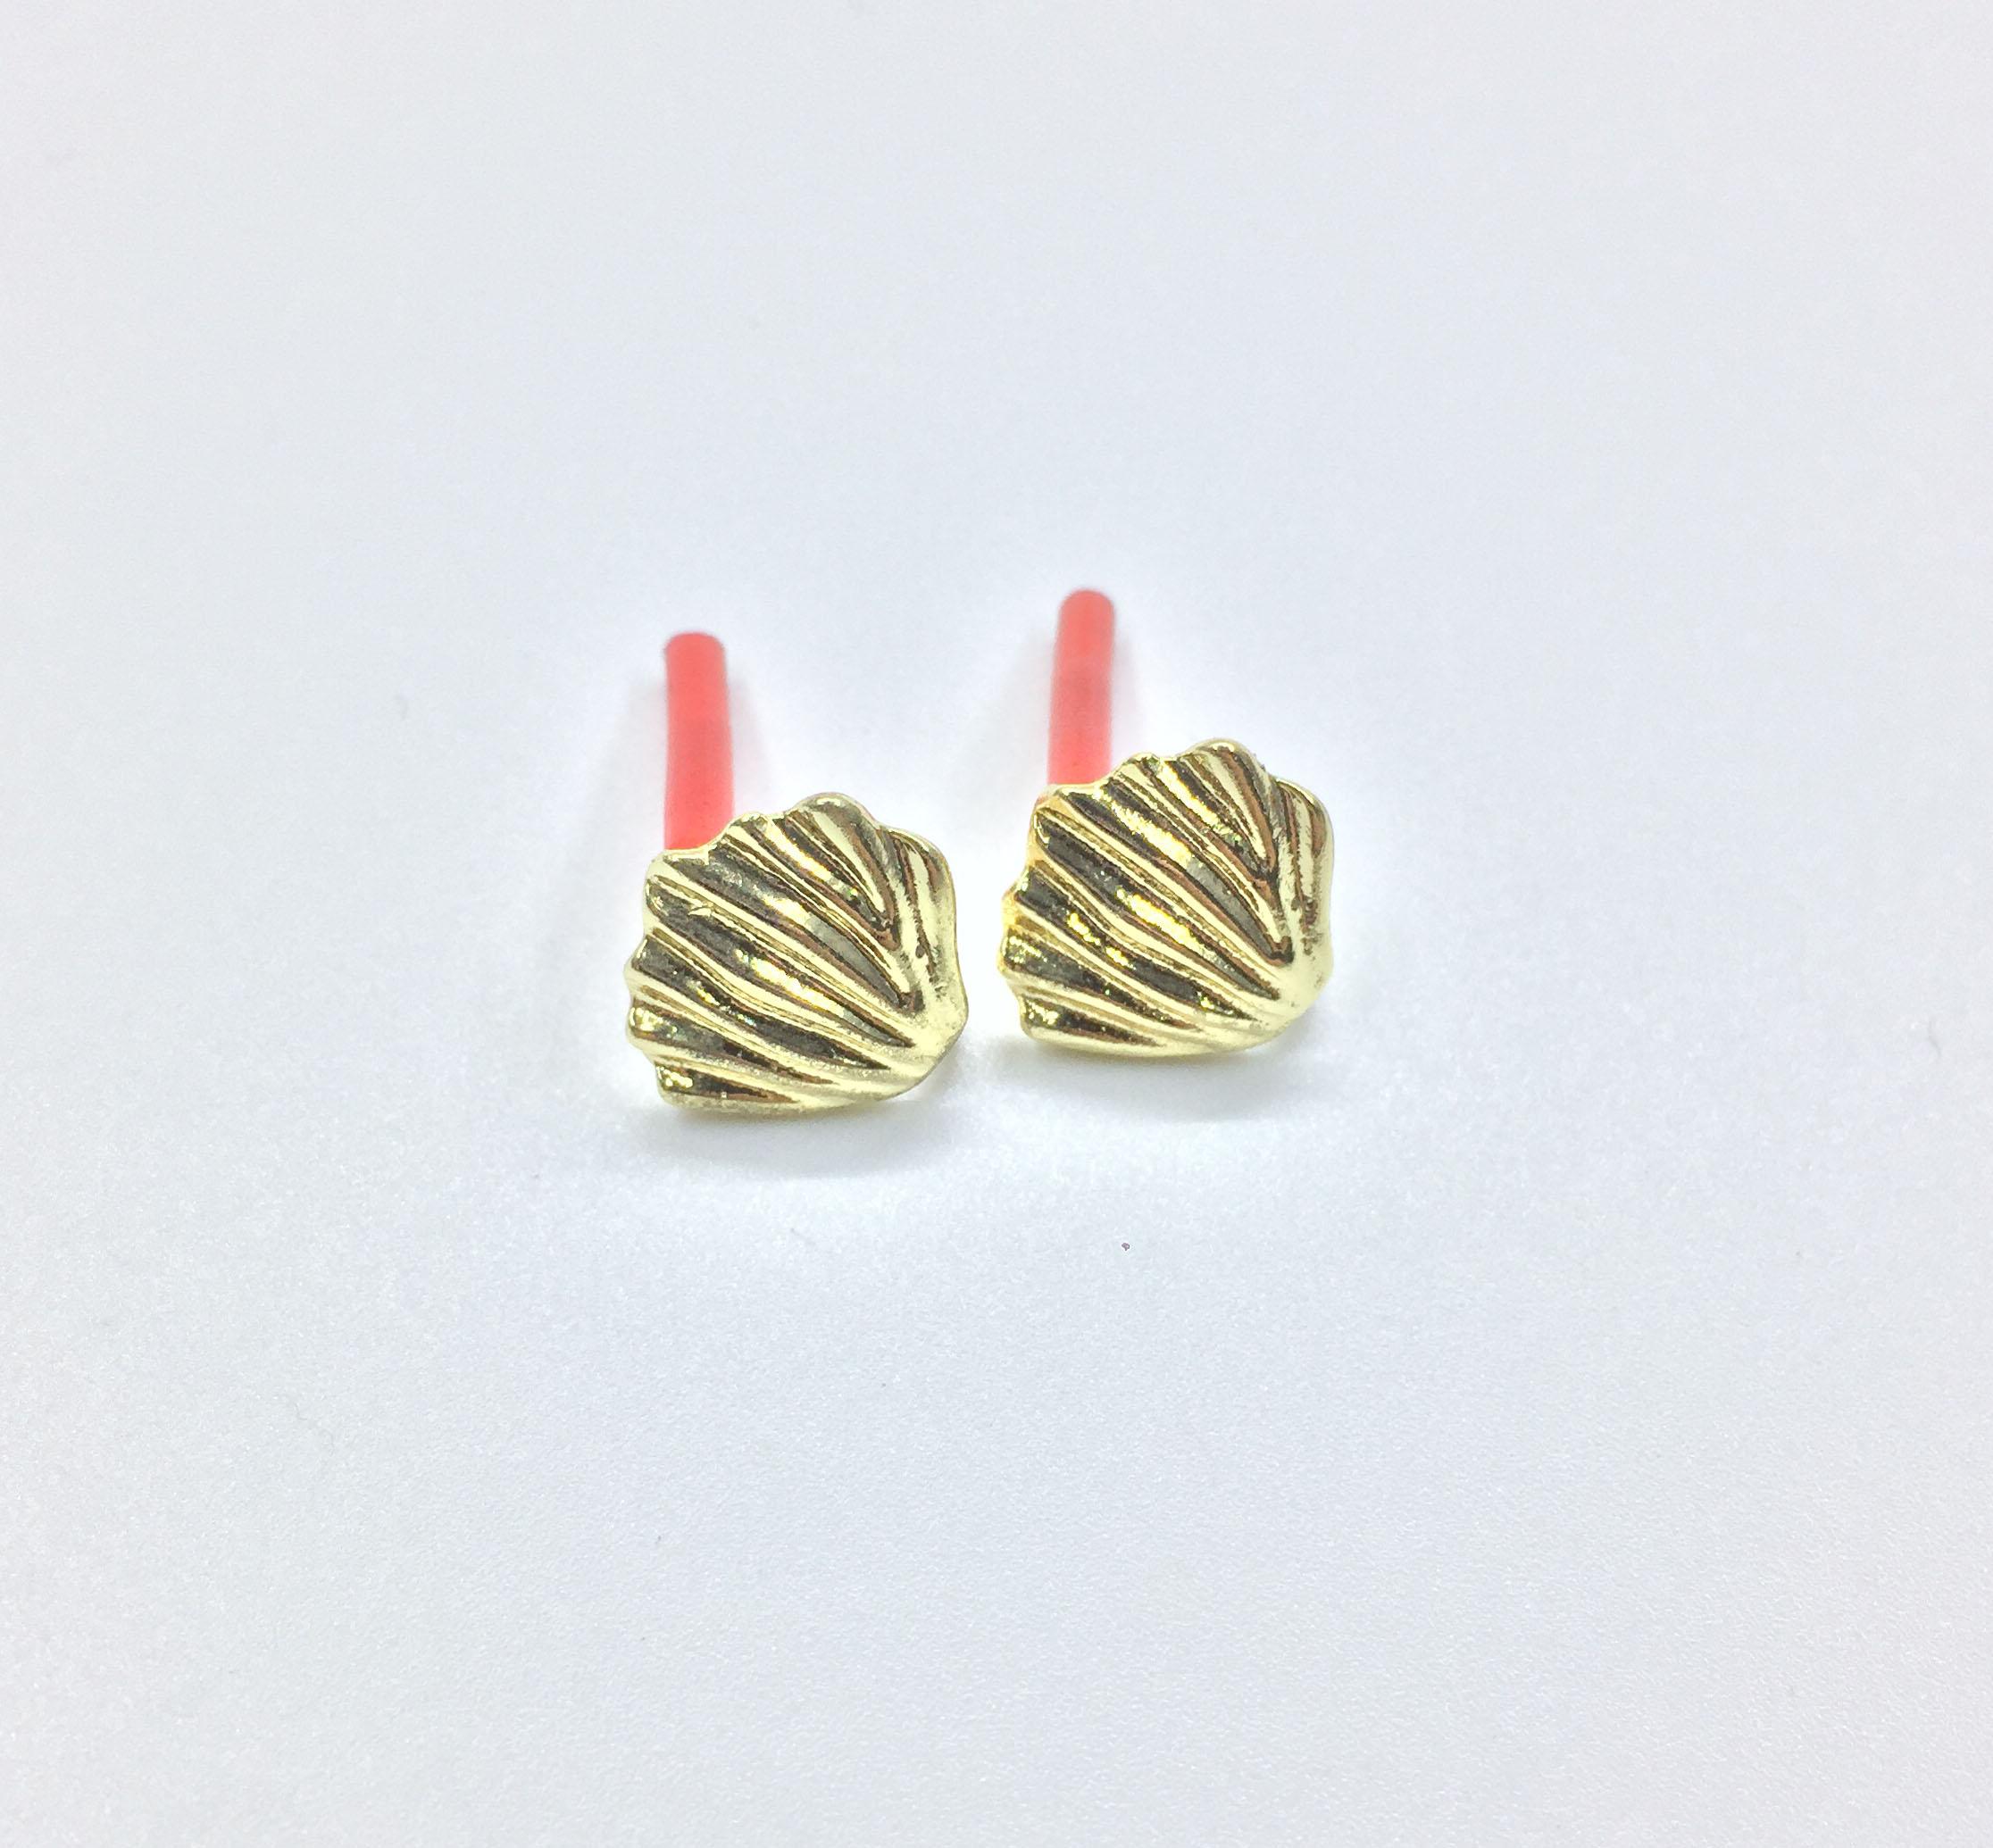 Eruifa Hot sell 10pcs 12mm Shell Stud Based Earring Zinc alloy Women Wholesales earring jewelry DIY handmade